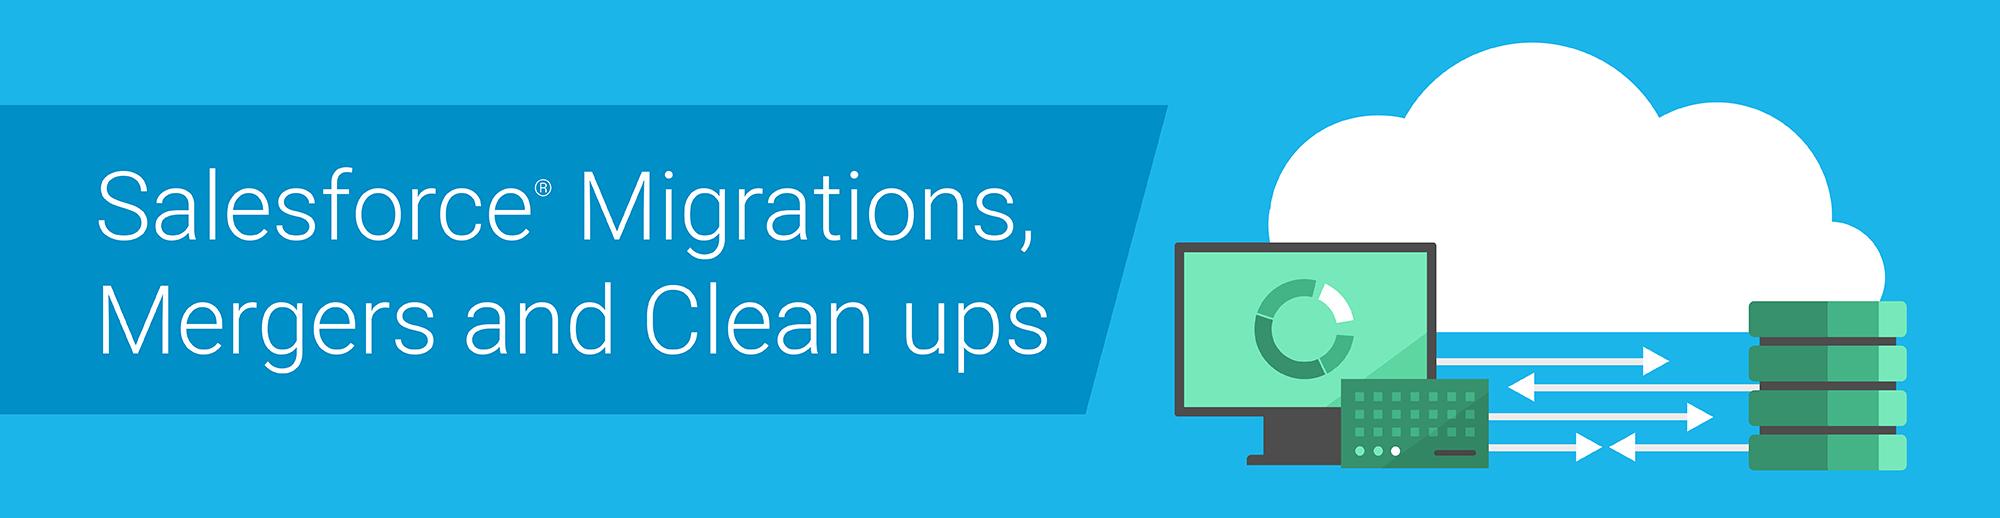 Salesforce Migrations, Salesforce Mergers, Salesforce Clean ups